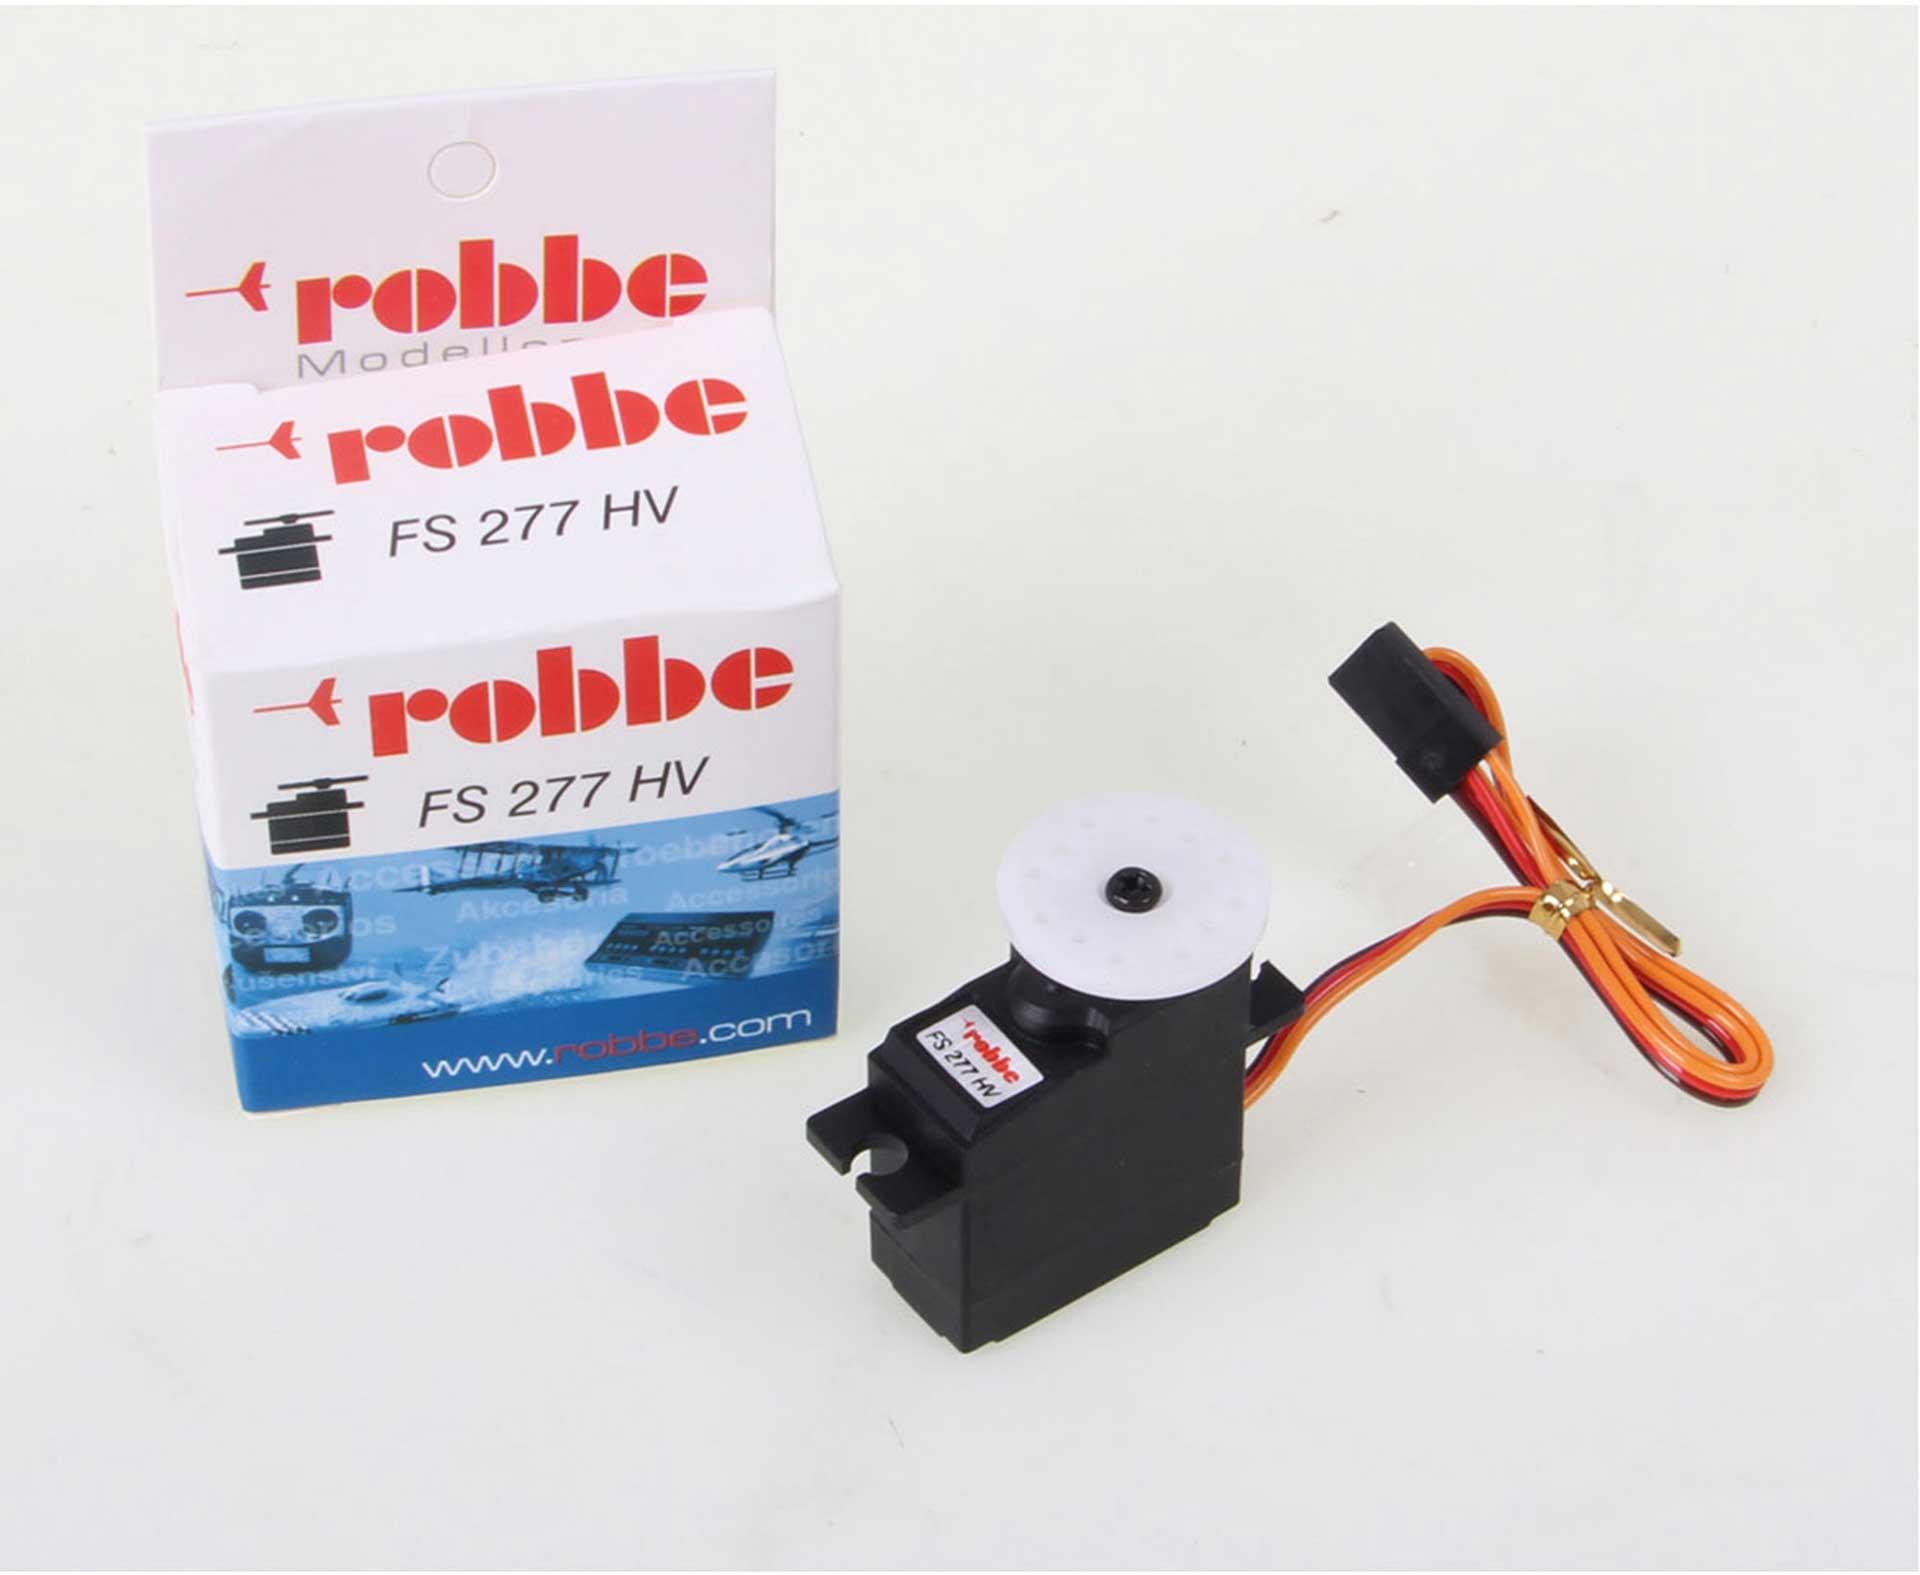 Robbe Modellsport FS 277 MG HV digital Servos